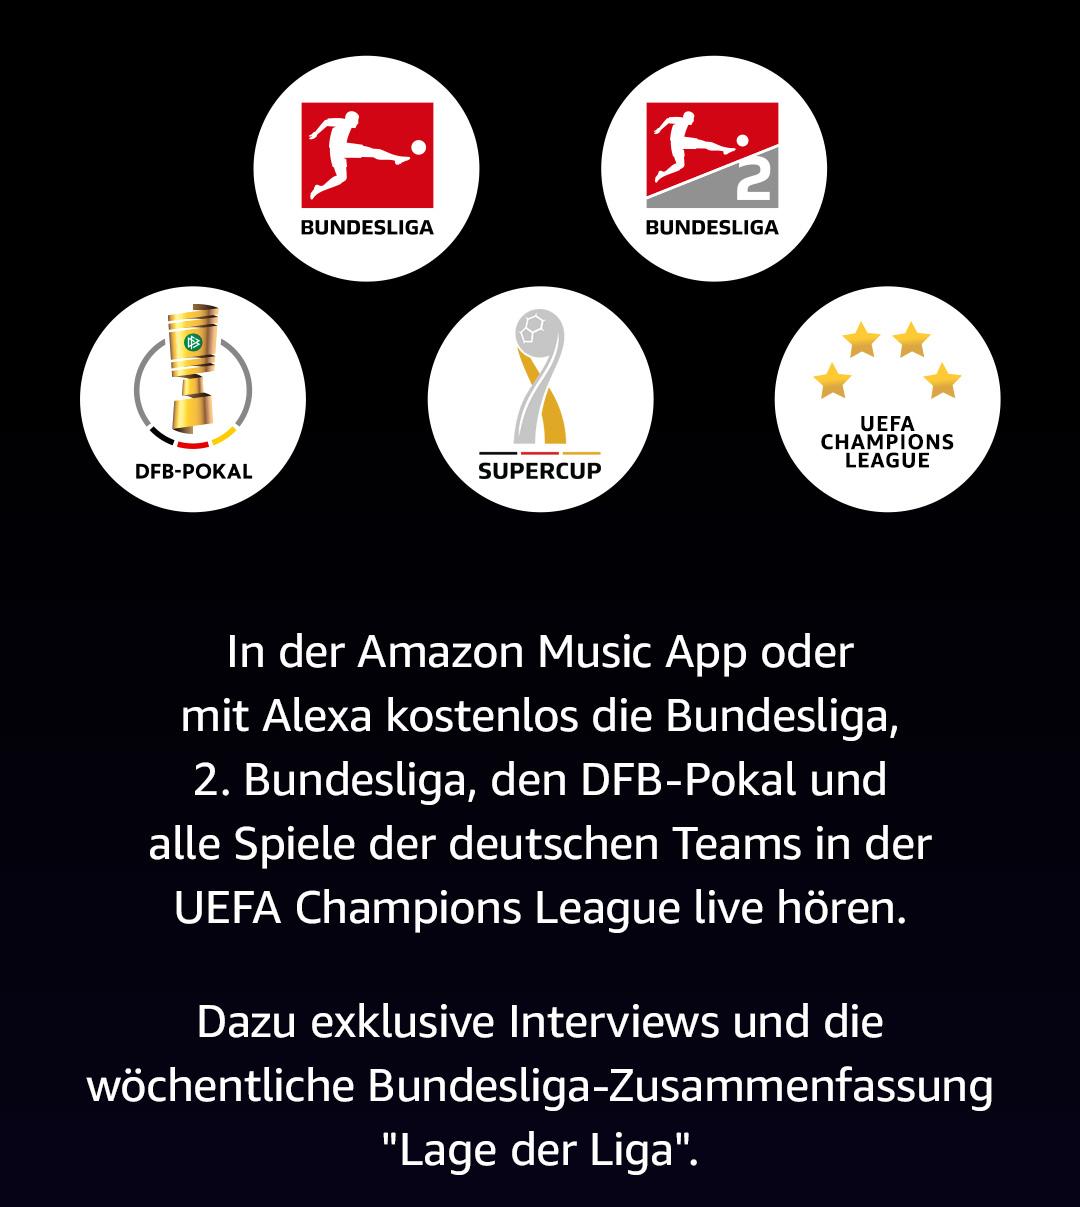 Kostenlos Bundesliga live bei Amazon hören